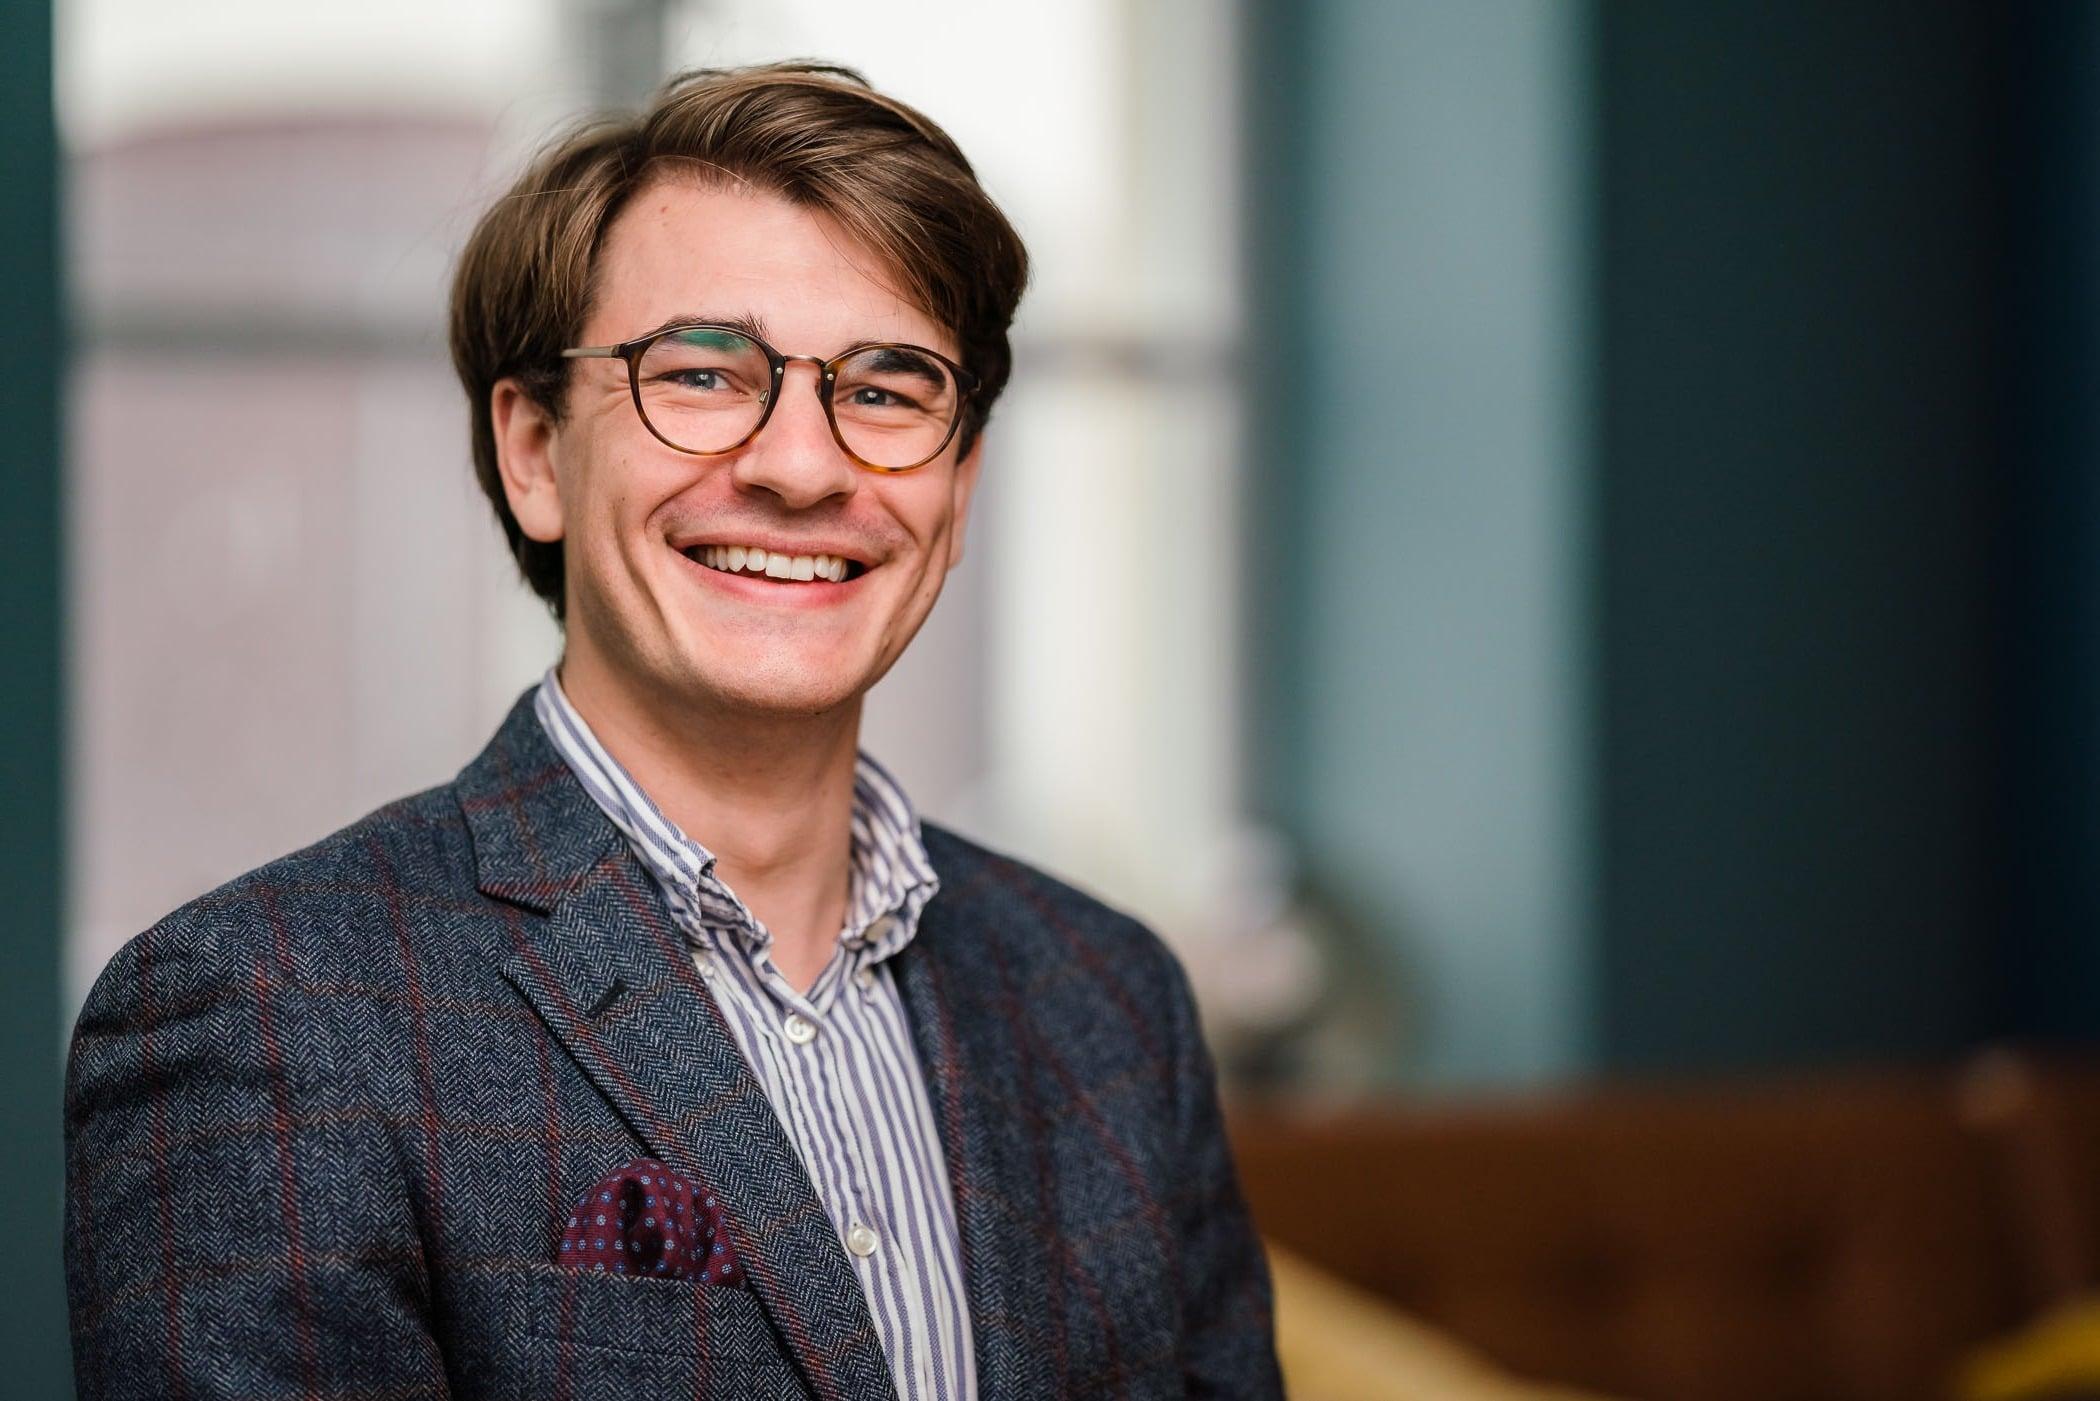 Client Coordinator Alexander Dryselius